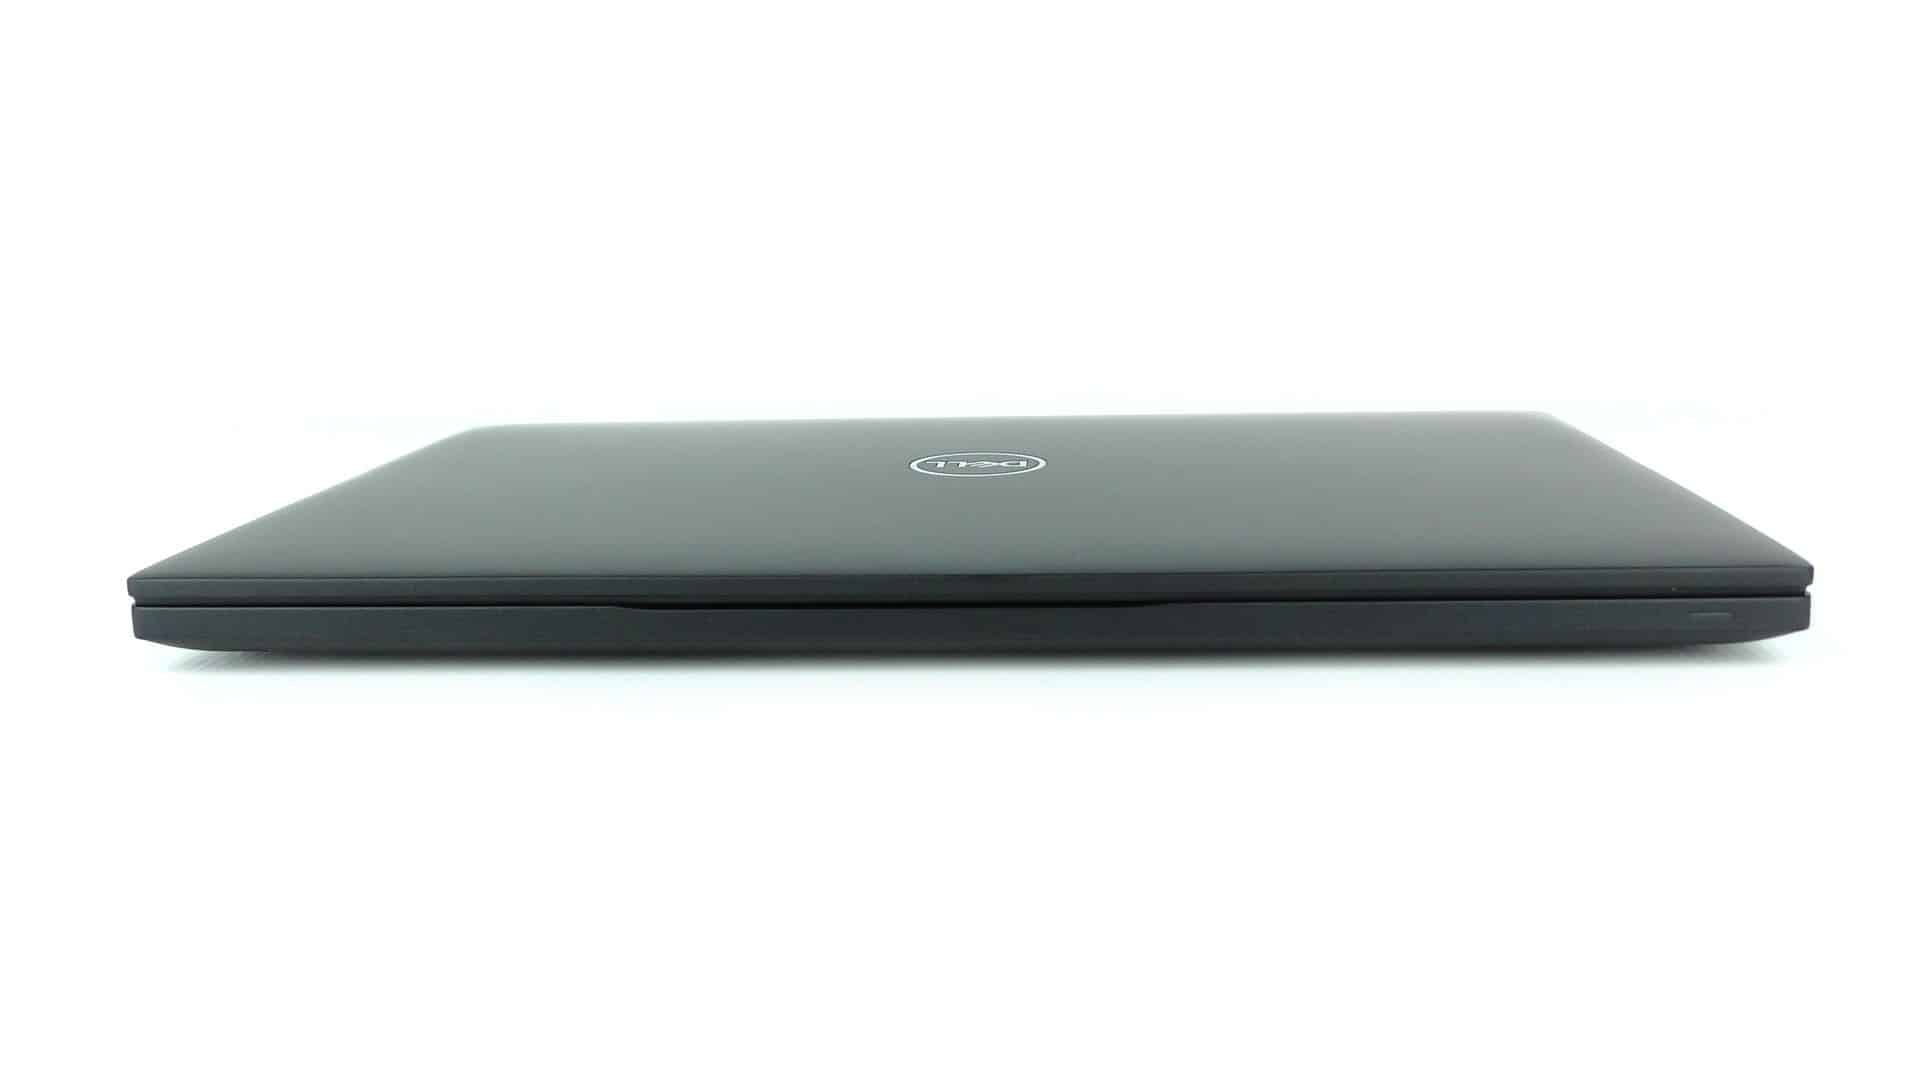 Dell Latitude 7390 - front notebooka